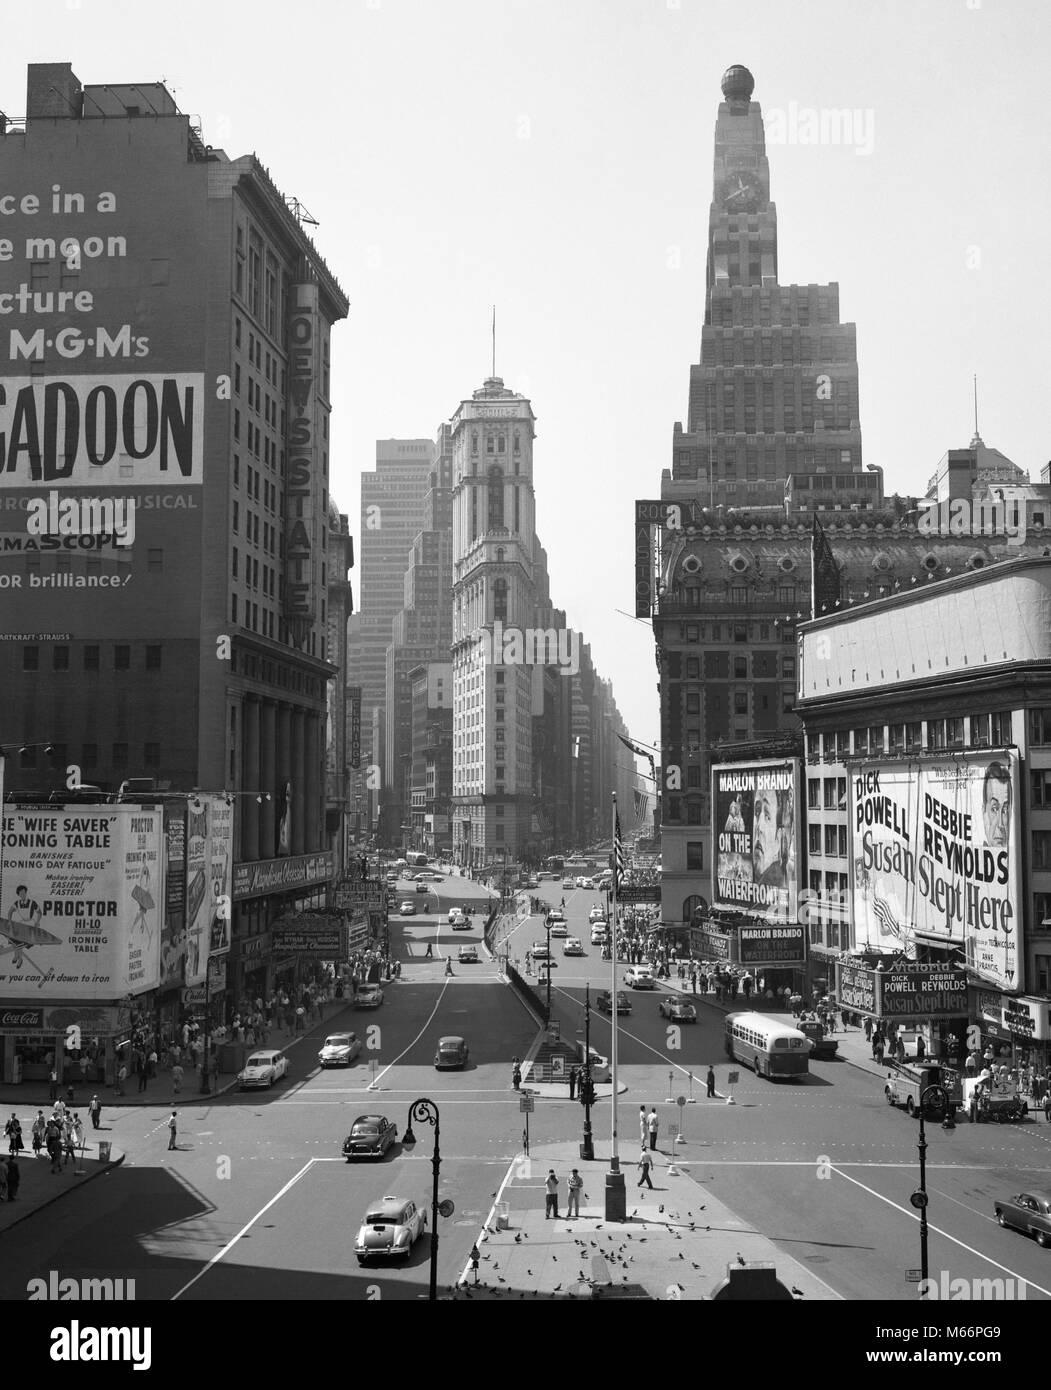 1950 TIMES SQUARE NEW YORK CITY IM SÜDEN VON DUFFY SQUARE NEW YORK USA-r 3639 Mai 001 HARS AUTOS AUFREGUNG Stockbild